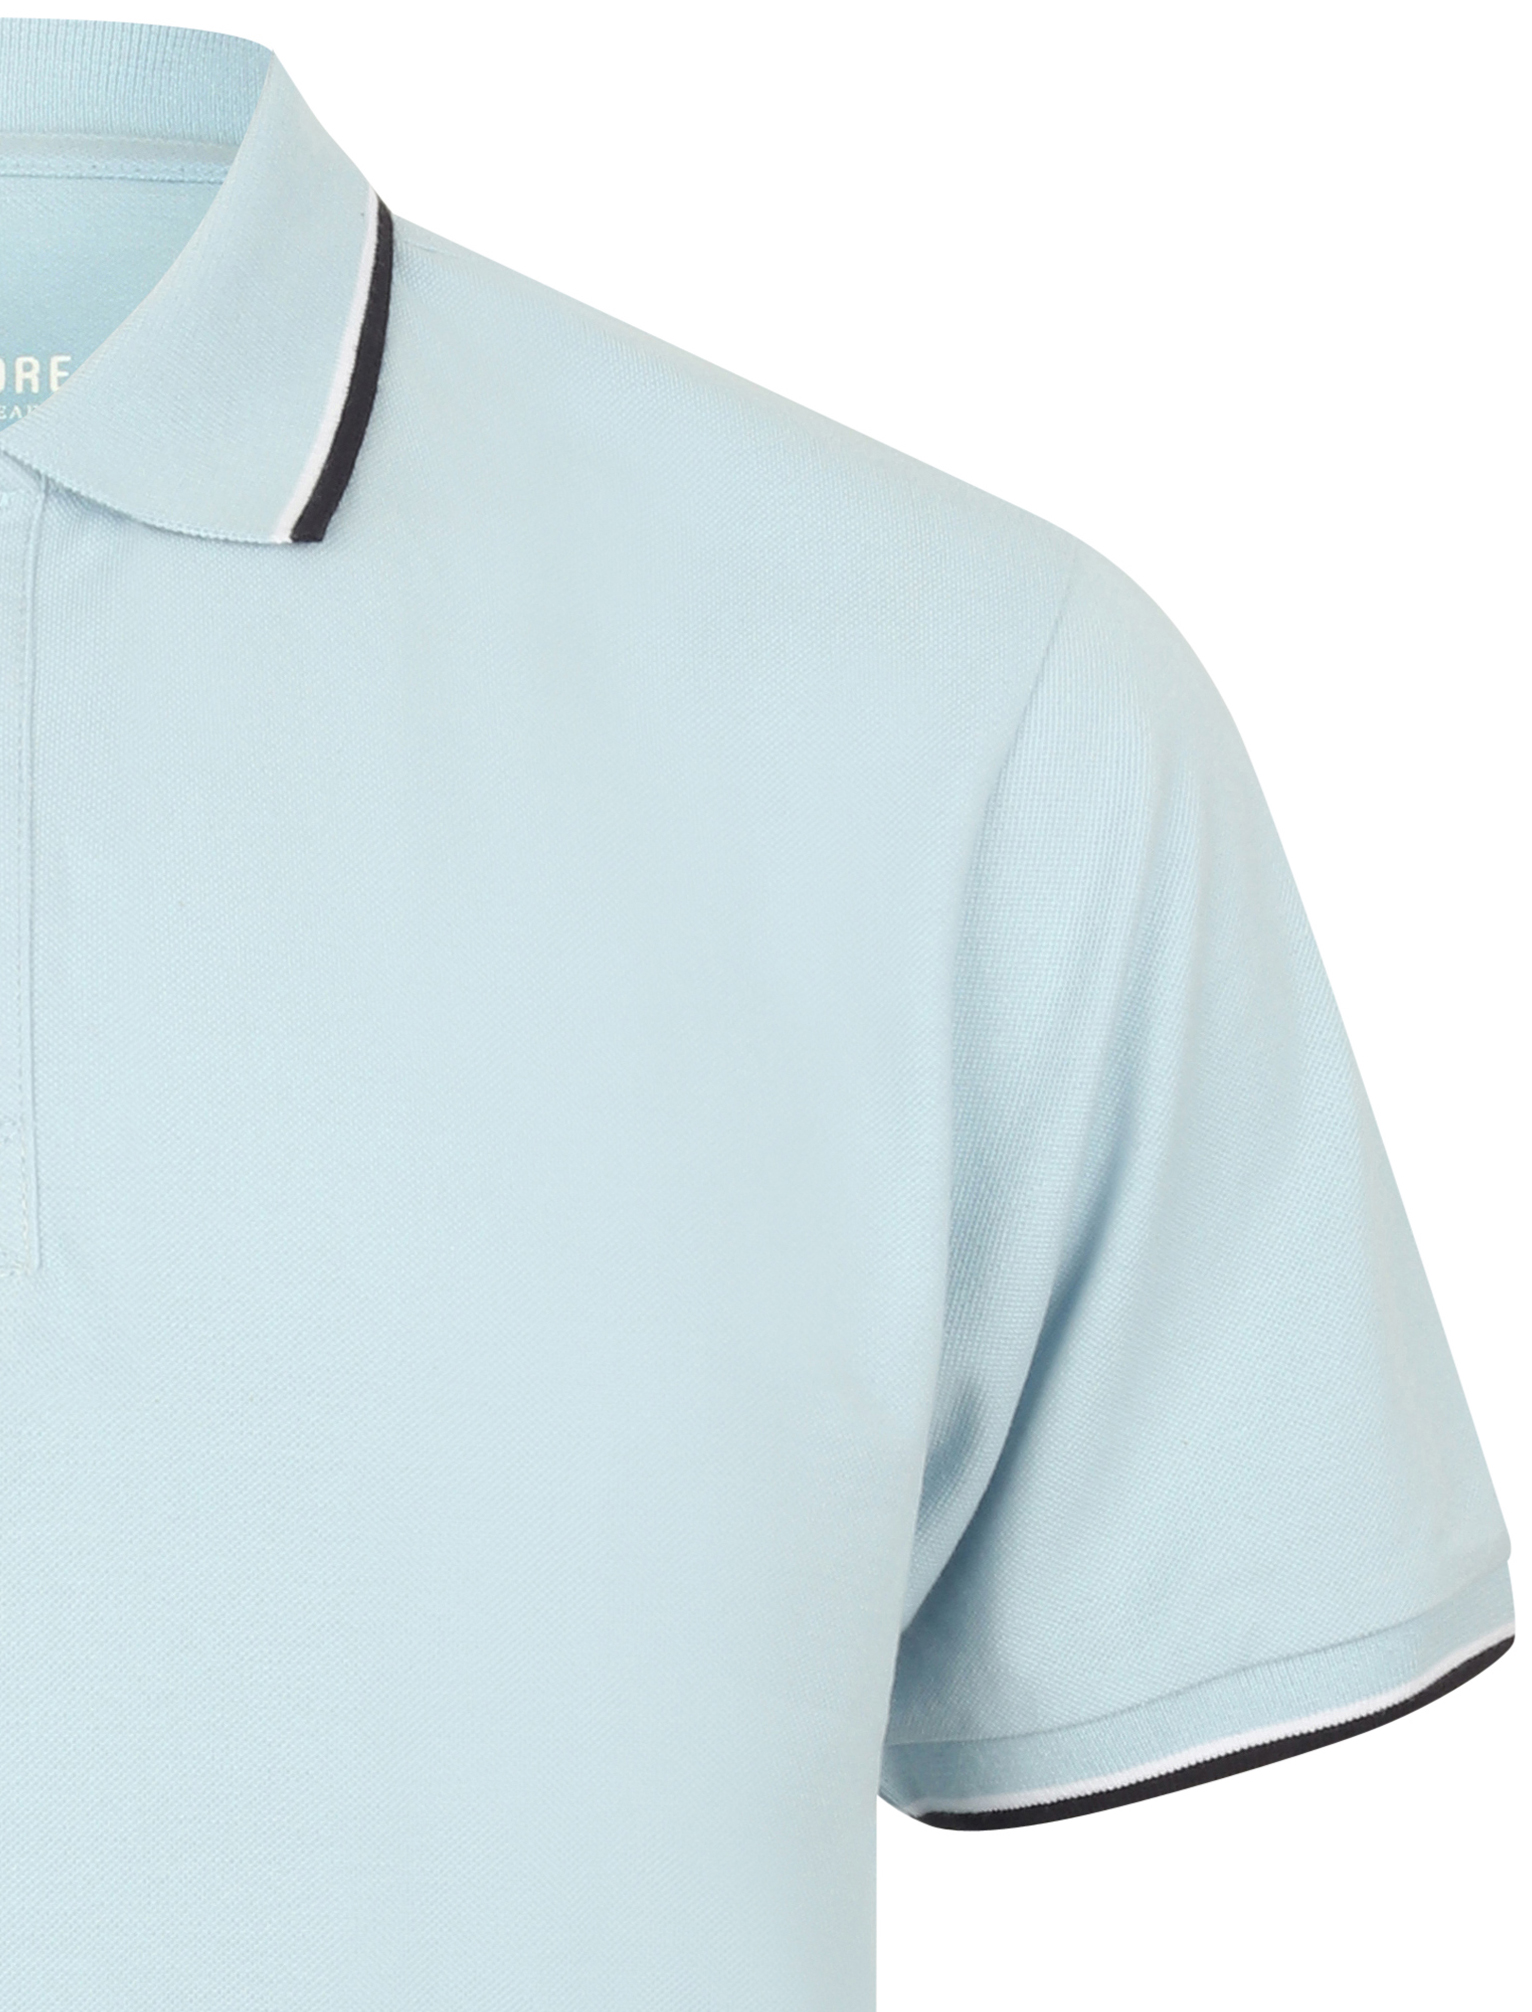 Sth-Shore-Mens-Plain-Polo-Shirt-100-Pique-Cotton-T-Shirt-Top-Collar-Size-M-XXL thumbnail 29